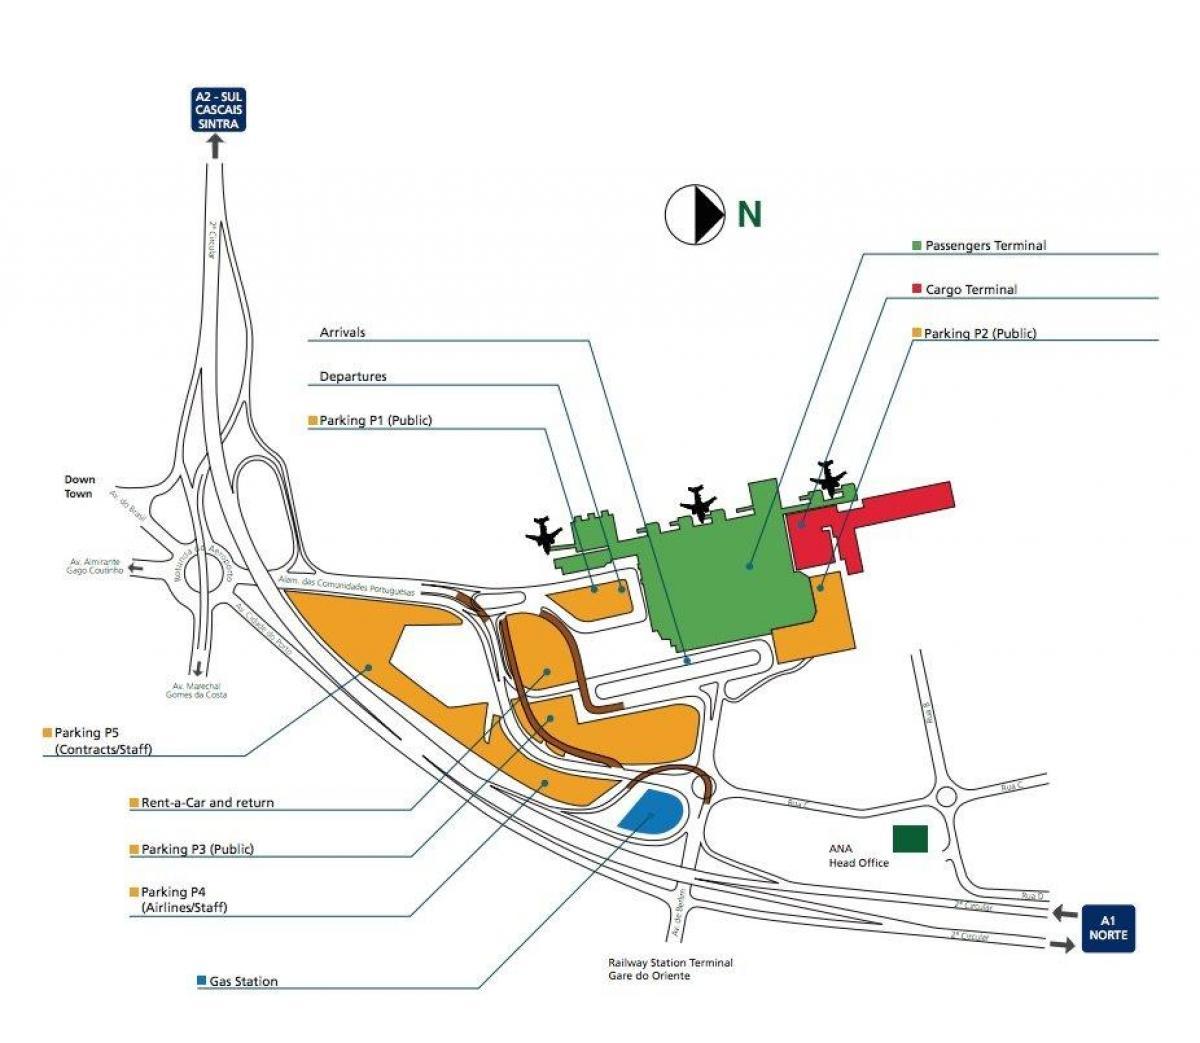 Flughafen Lissabon Ankunft Plan